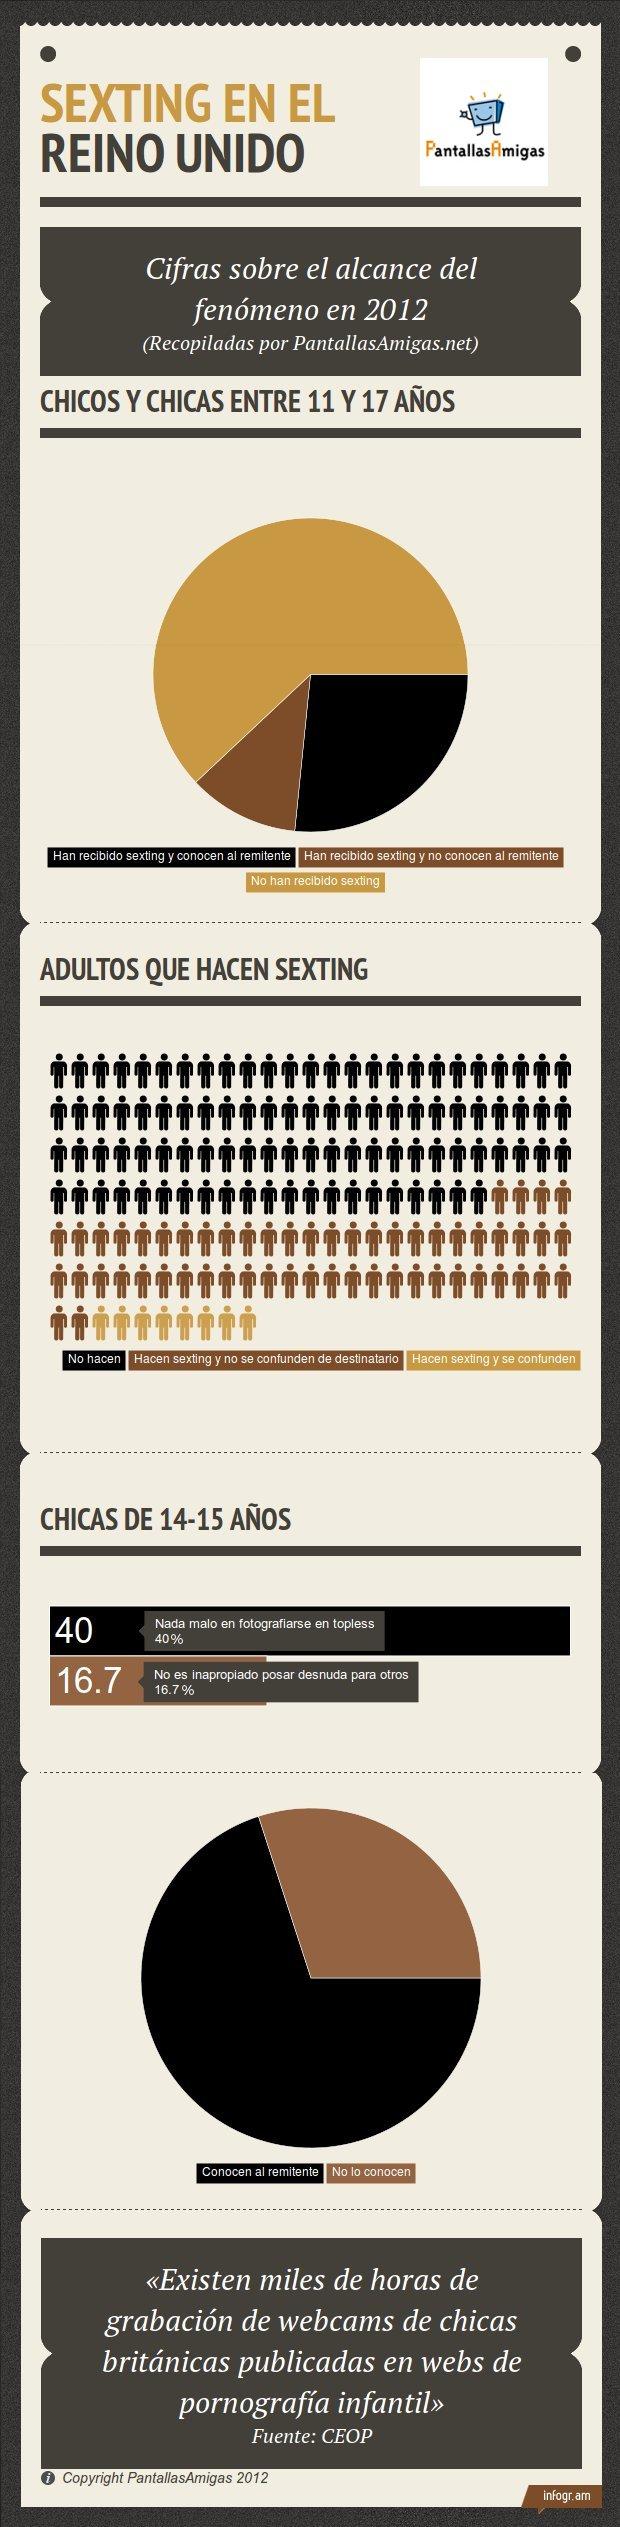 Estadísticas sexting Reino Unido